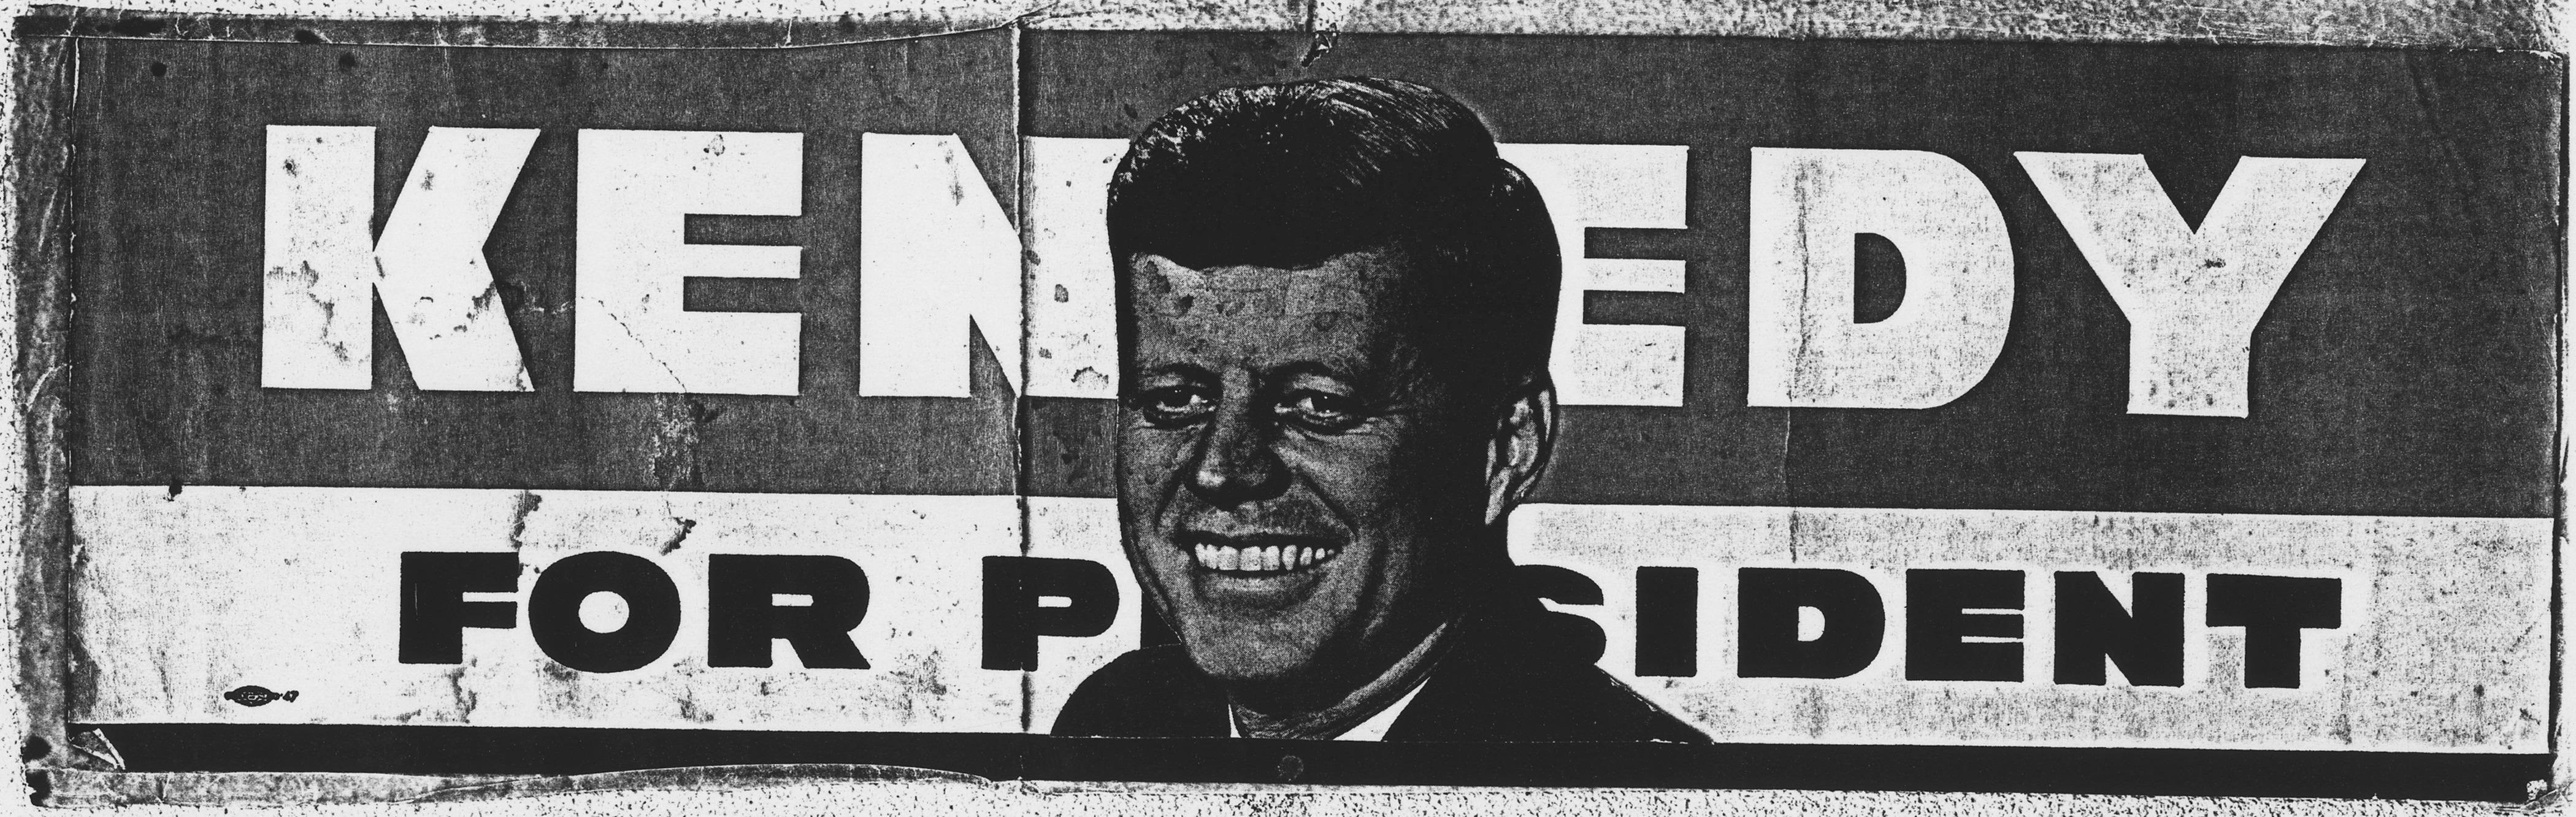 John F Kennedy Bumper Stickers